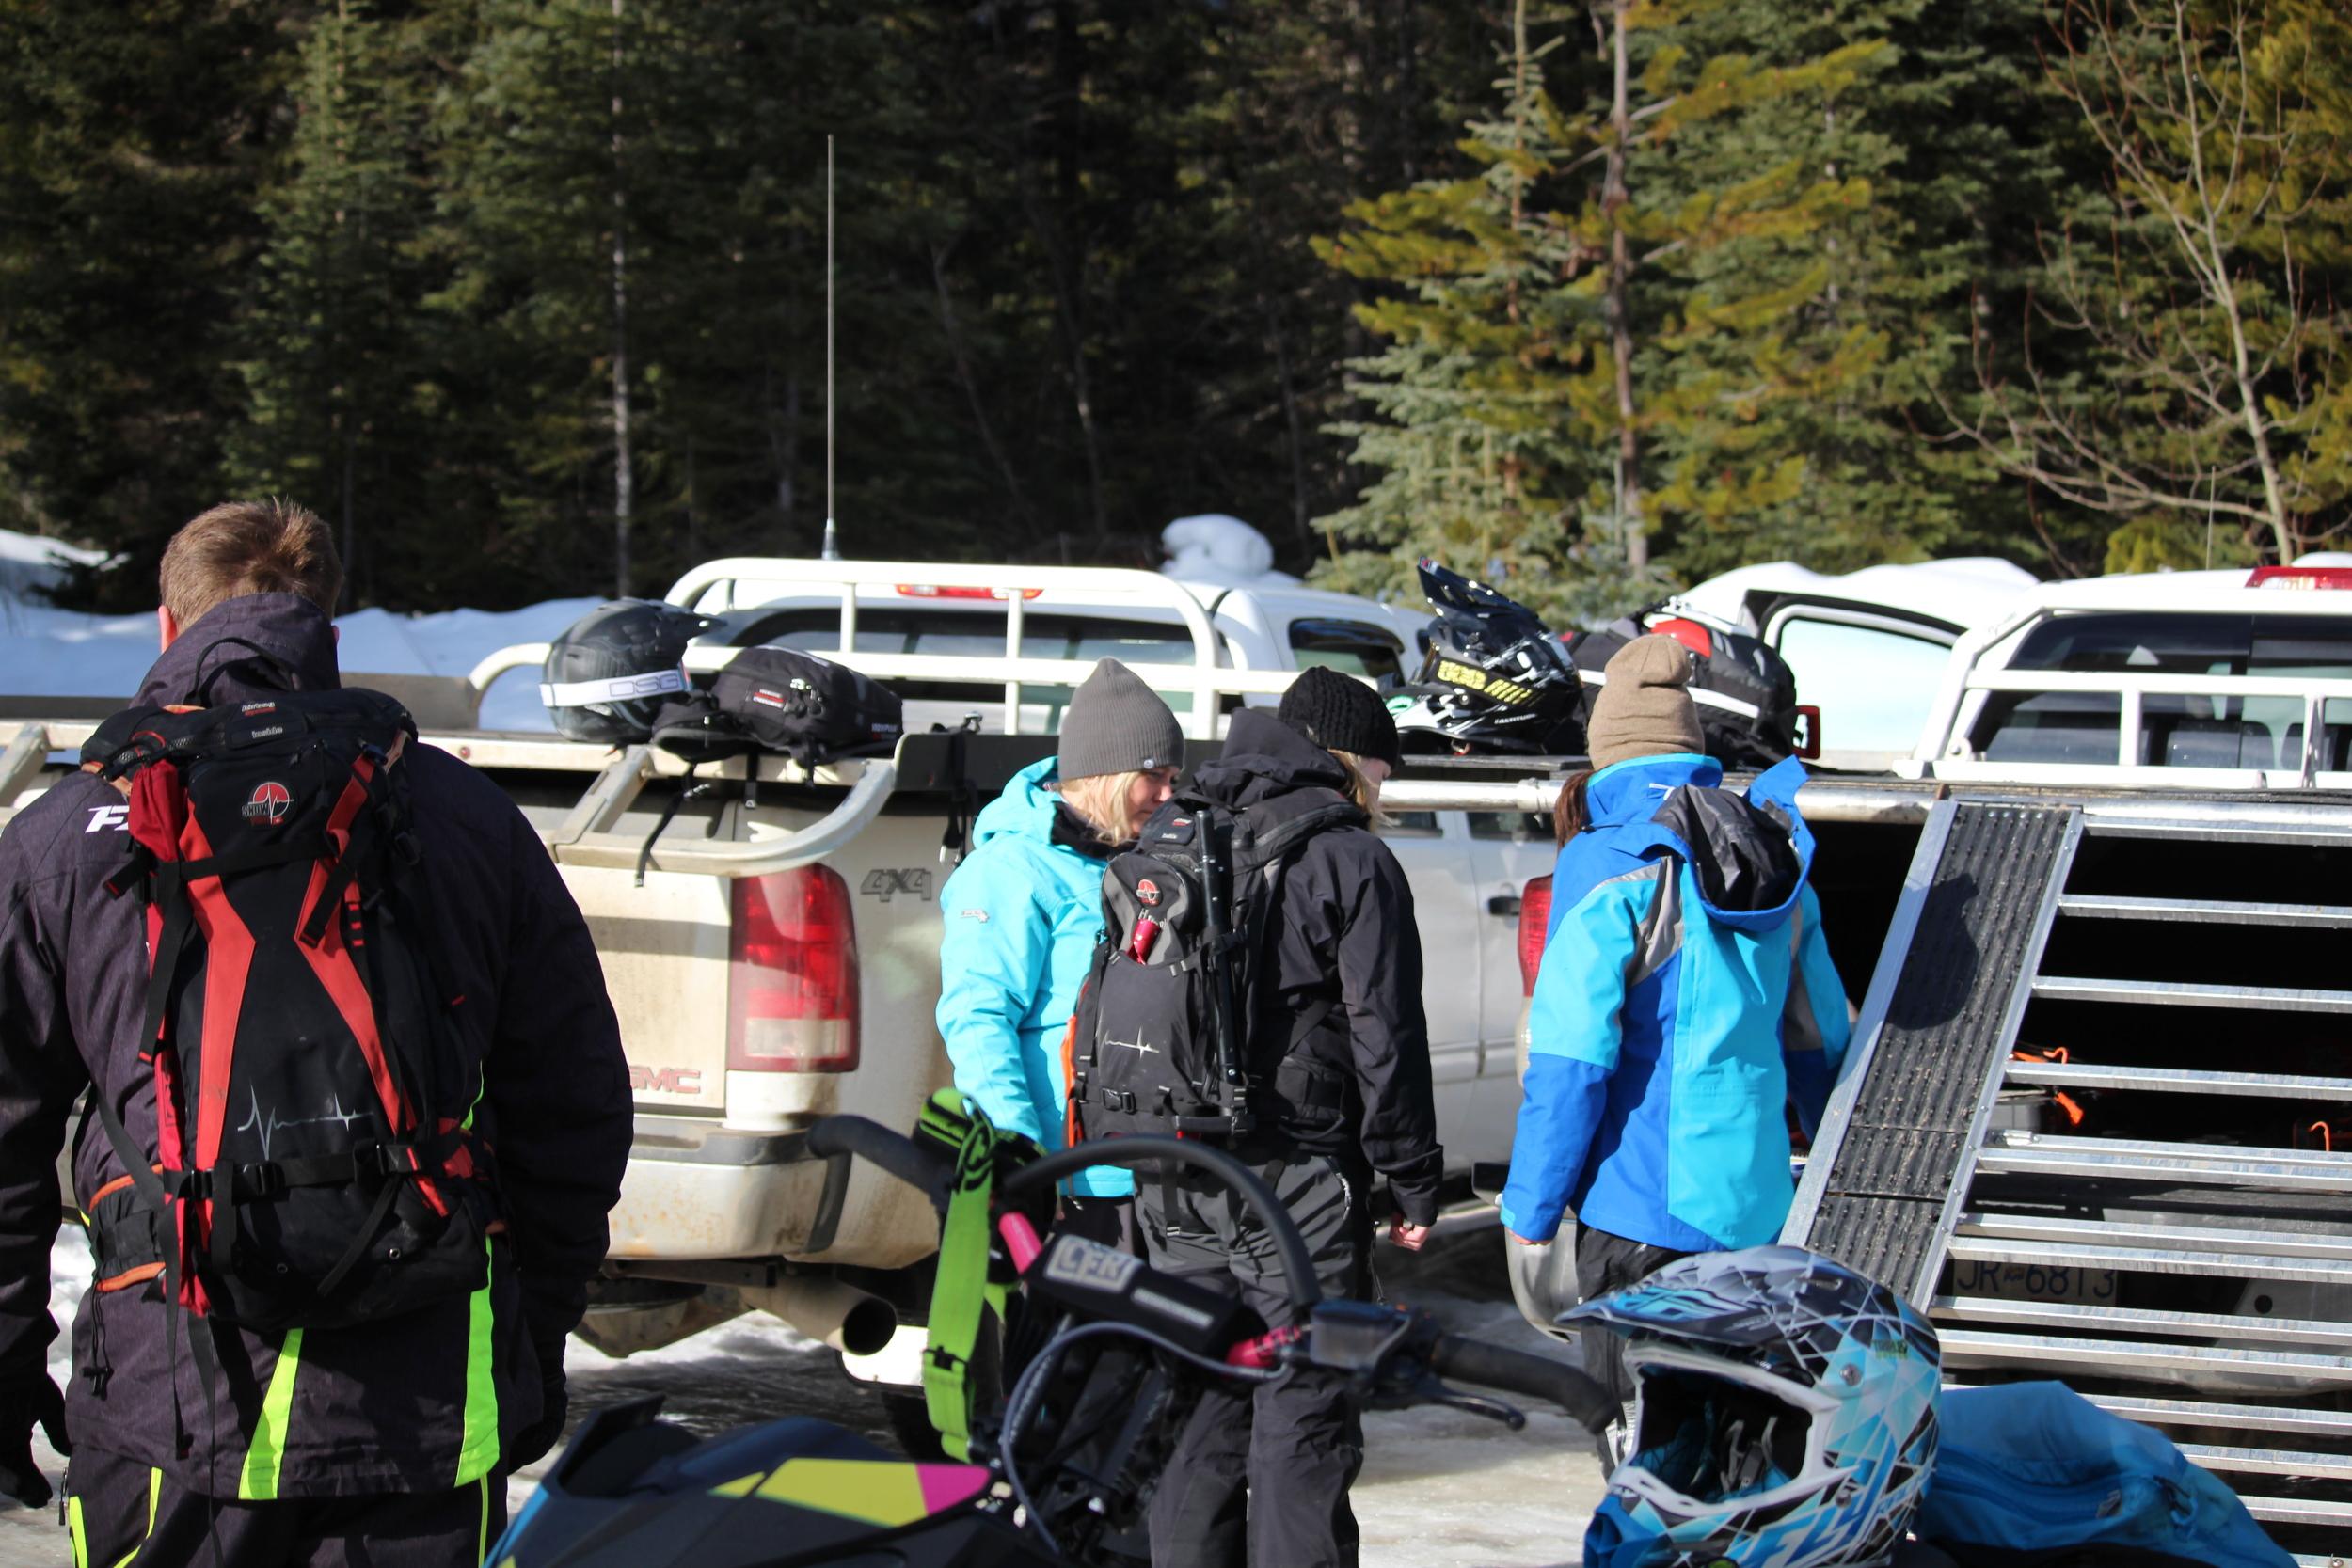 Lanina sled camp 003 (1).jpg